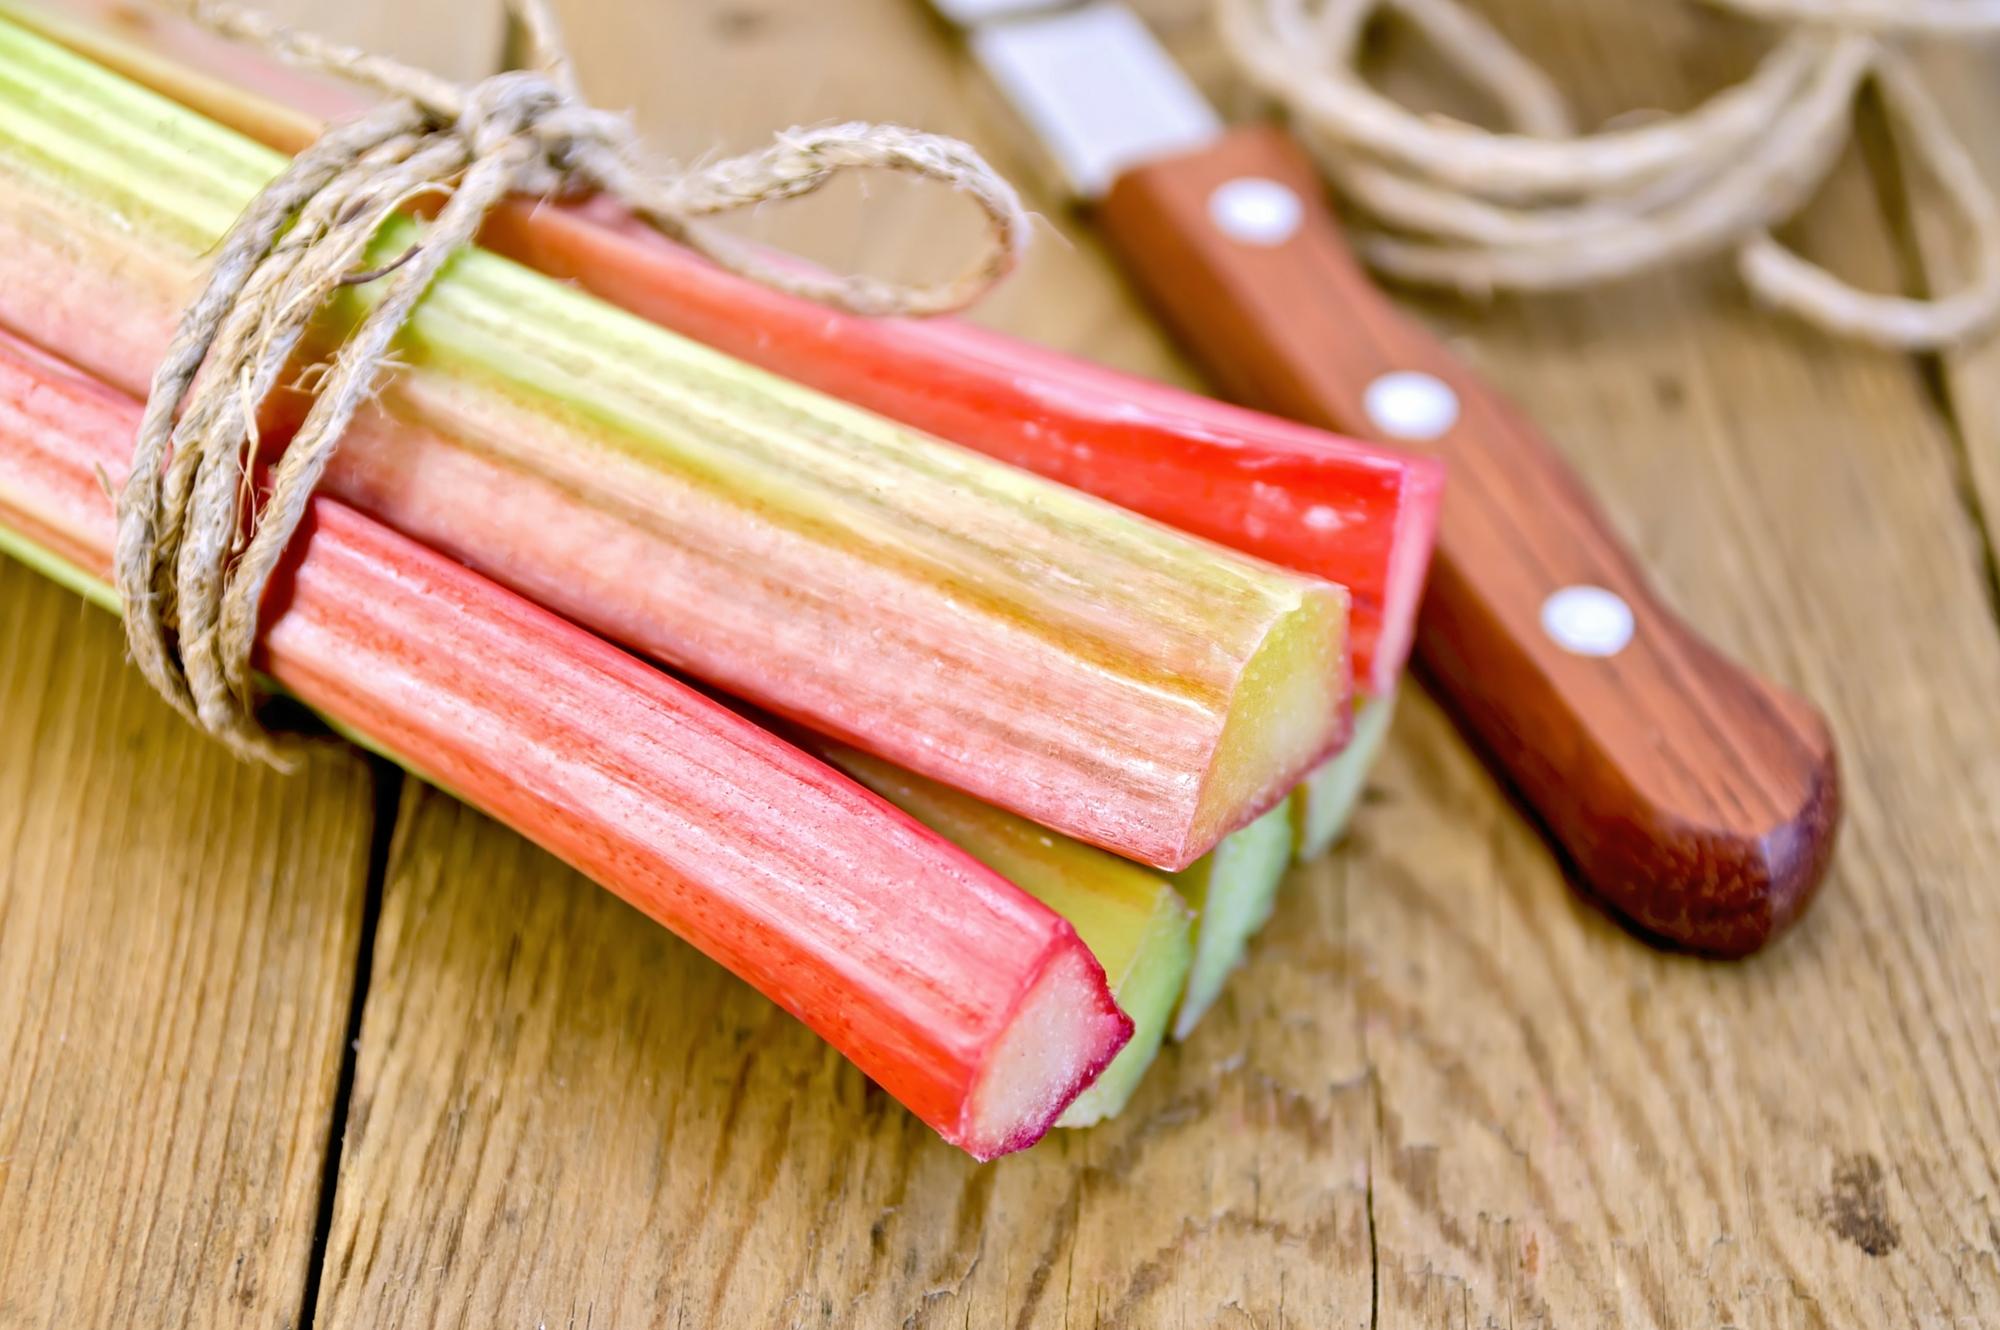 Saucepan Kids - honey-baked rhurbarb with home grown rhubarb - things to do with rhubarb